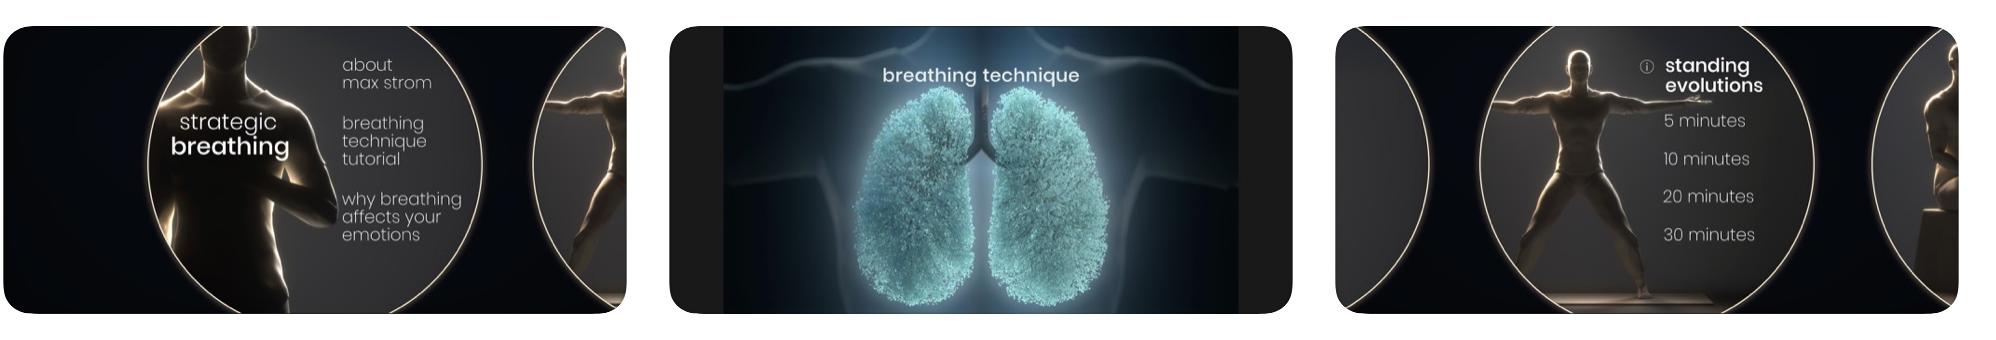 max strom, strategic breathing, app, angst, adem